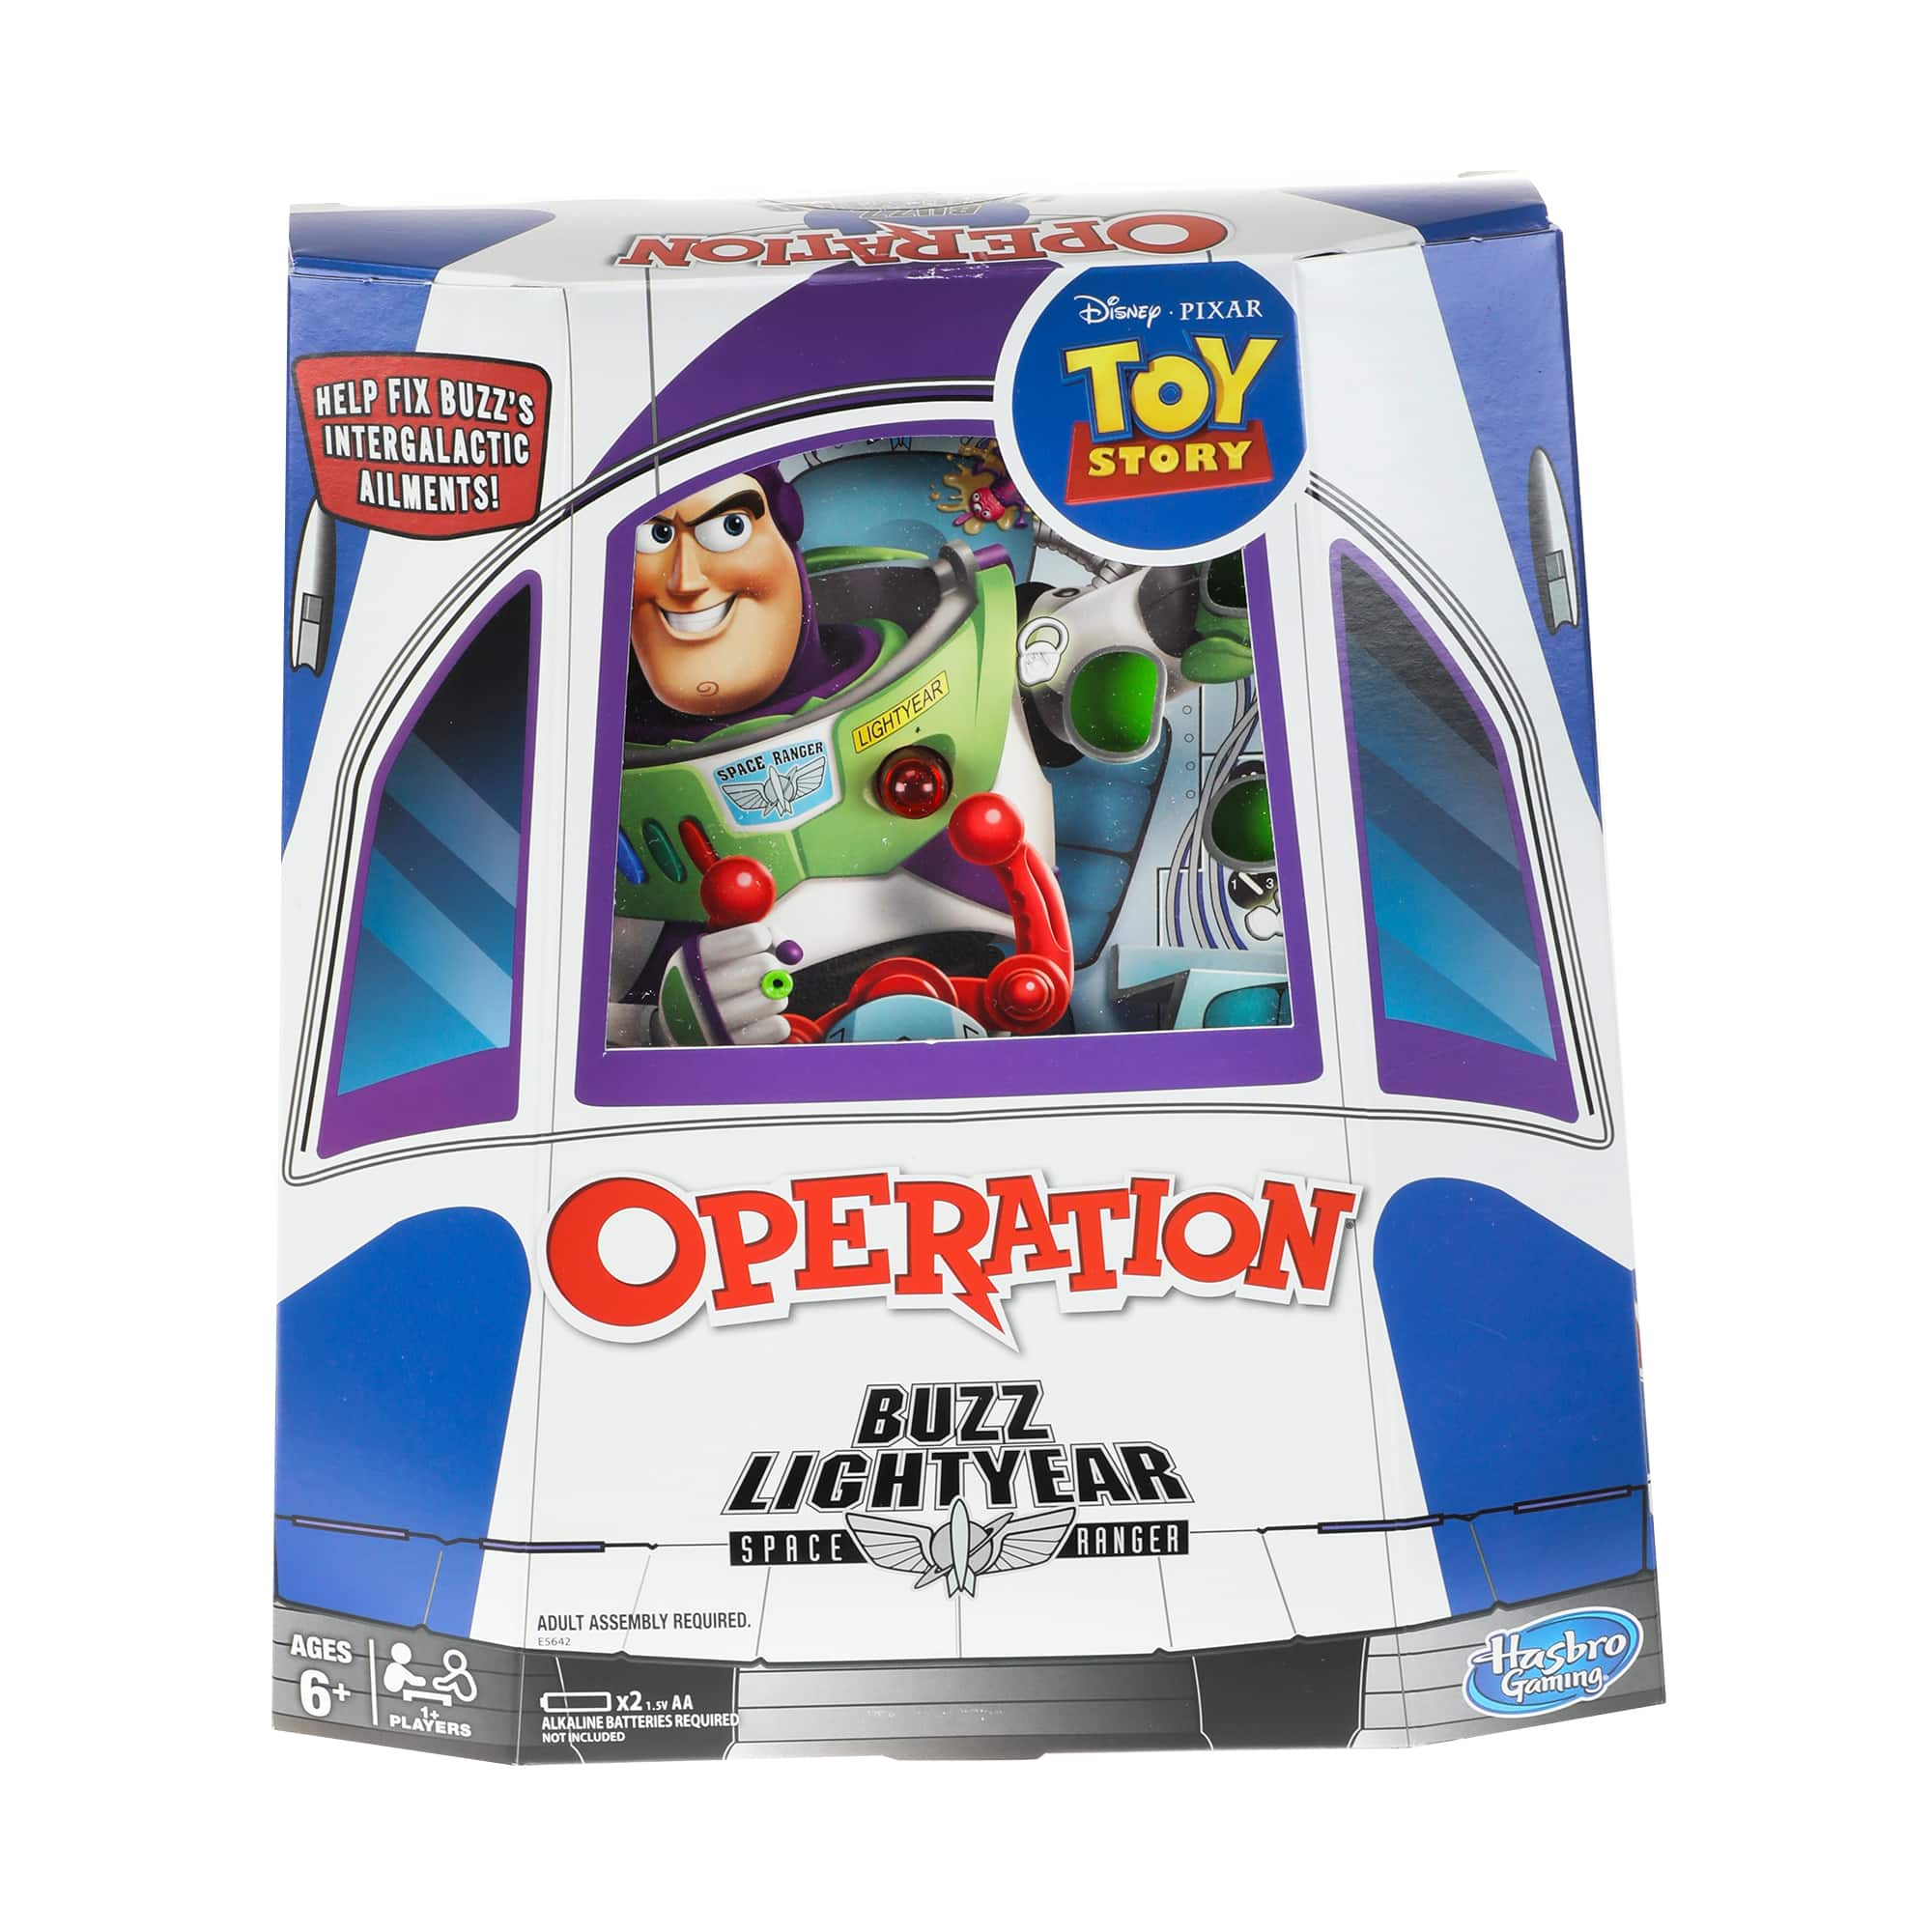 Operation: Disney/Pixar Toy Story Buzz Lightyear Board Game - $6.88 + Free Store Pickup